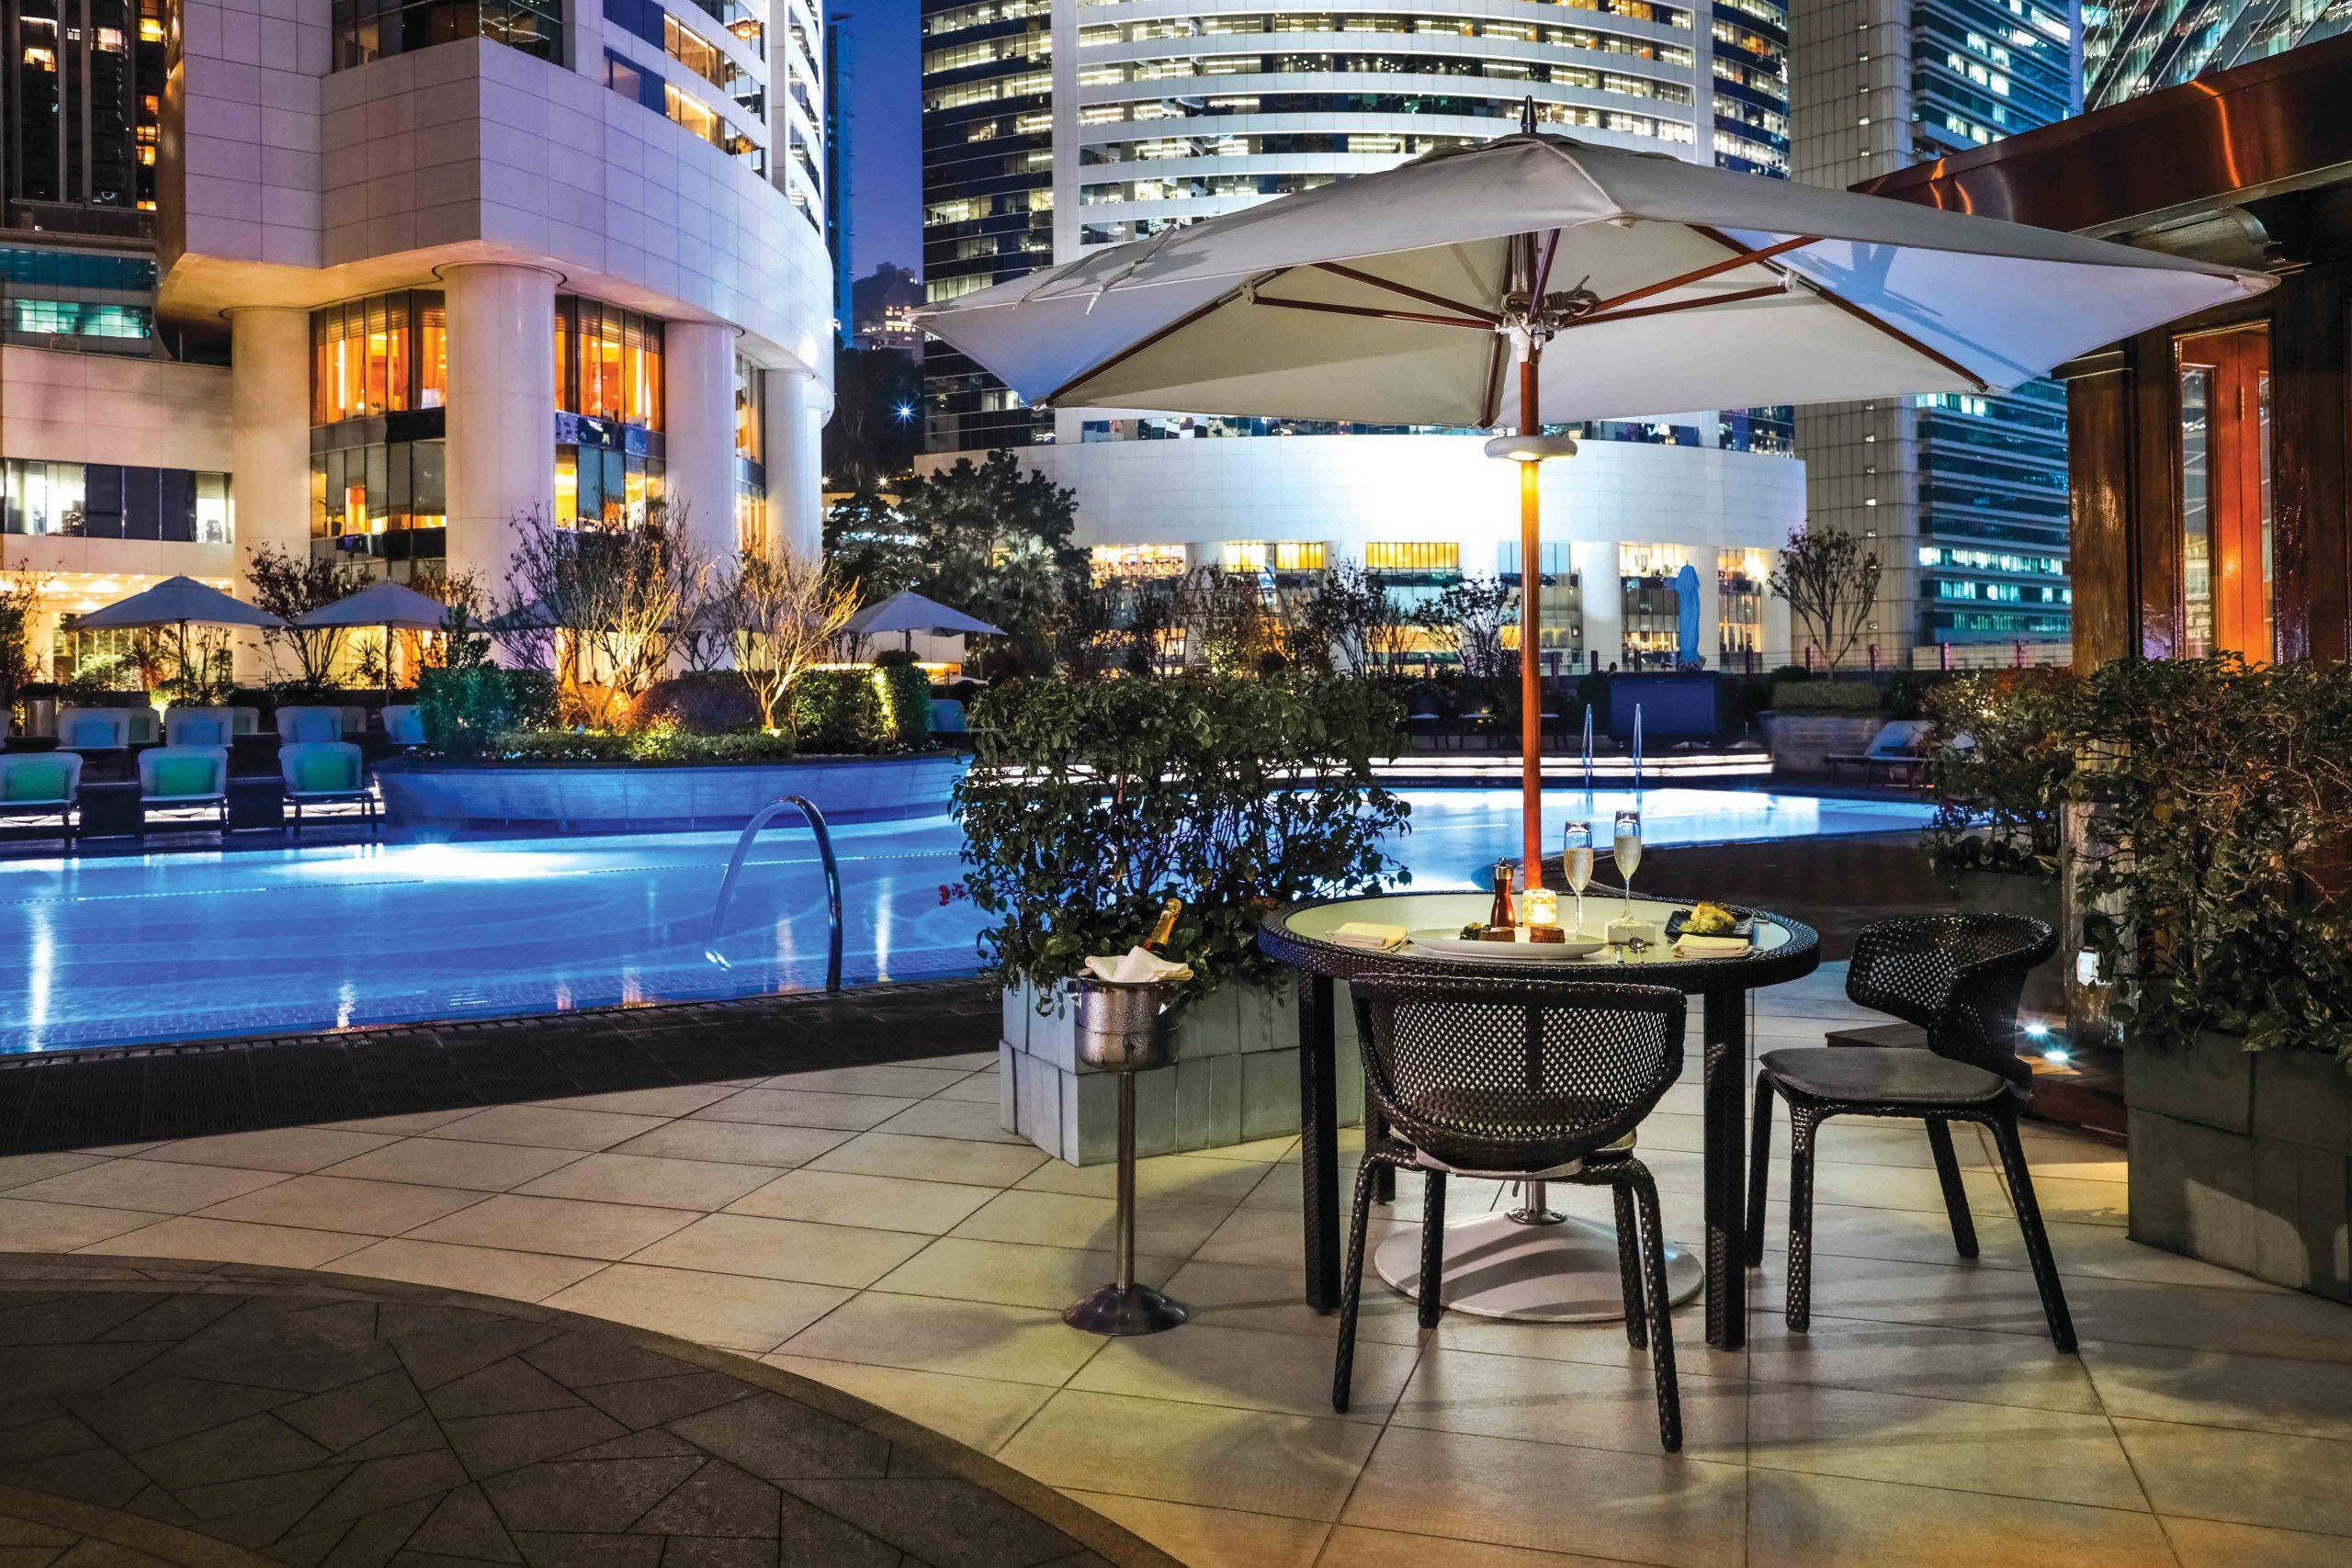 JW Marriott Hotel HK - Fish Bar Dinner